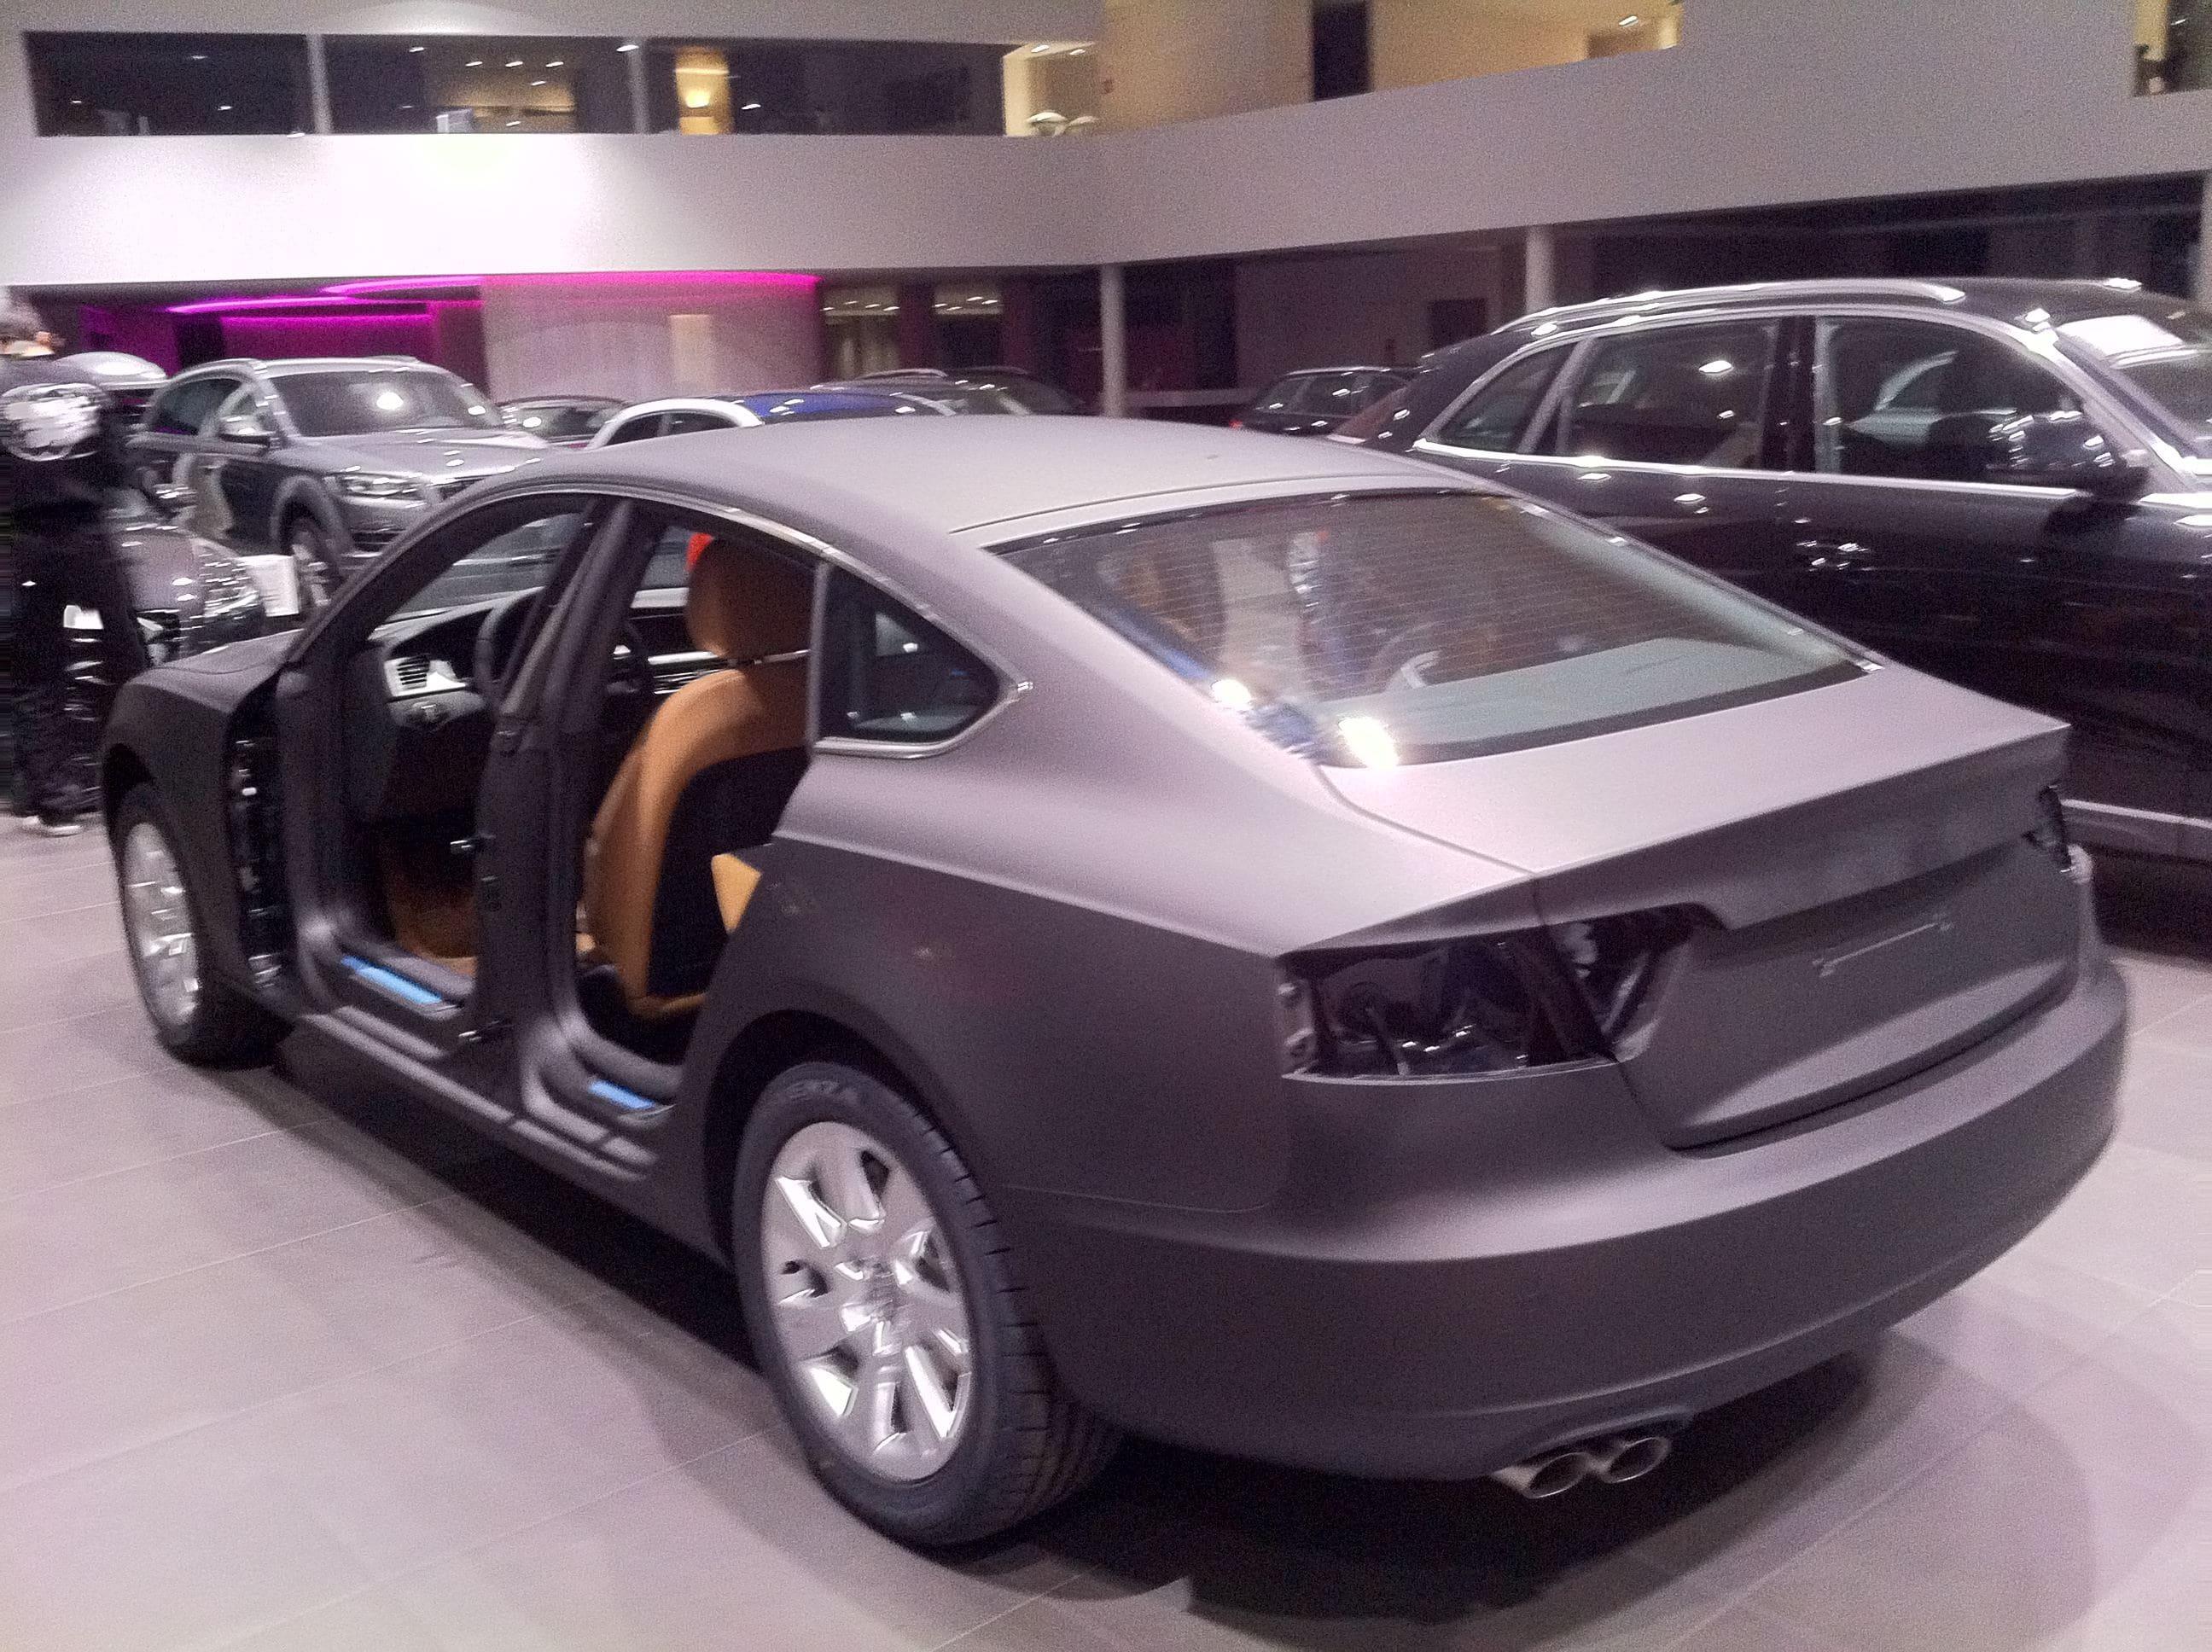 Audi A5 Sportback met Mat Grijze Wrap, Carwrapping door Wrapmyride.nu Foto-nr:4787, ©2021